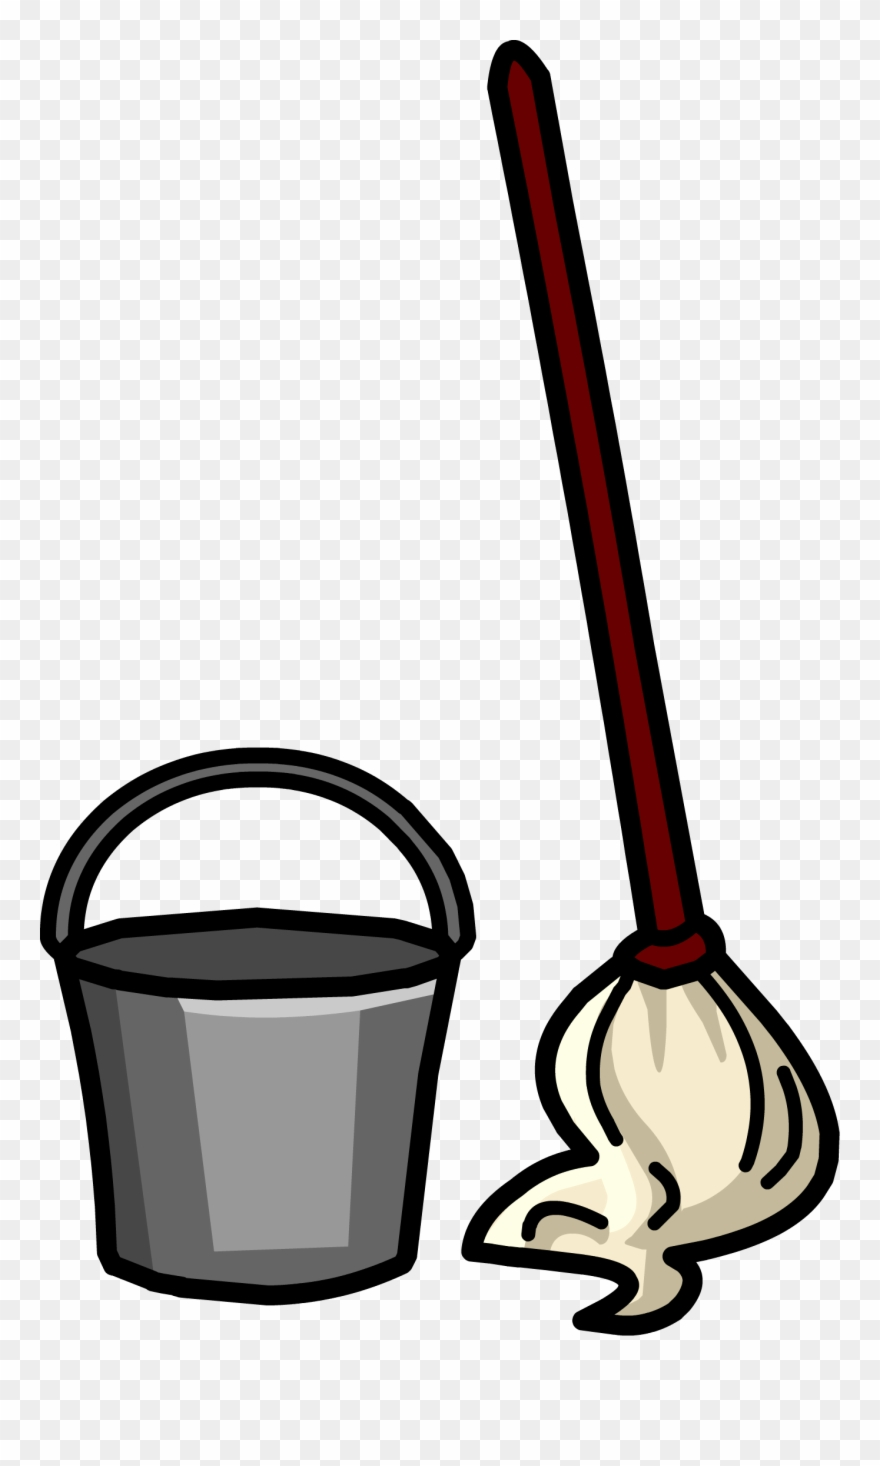 Free Mop Clip Art Bucket Broom Pic.